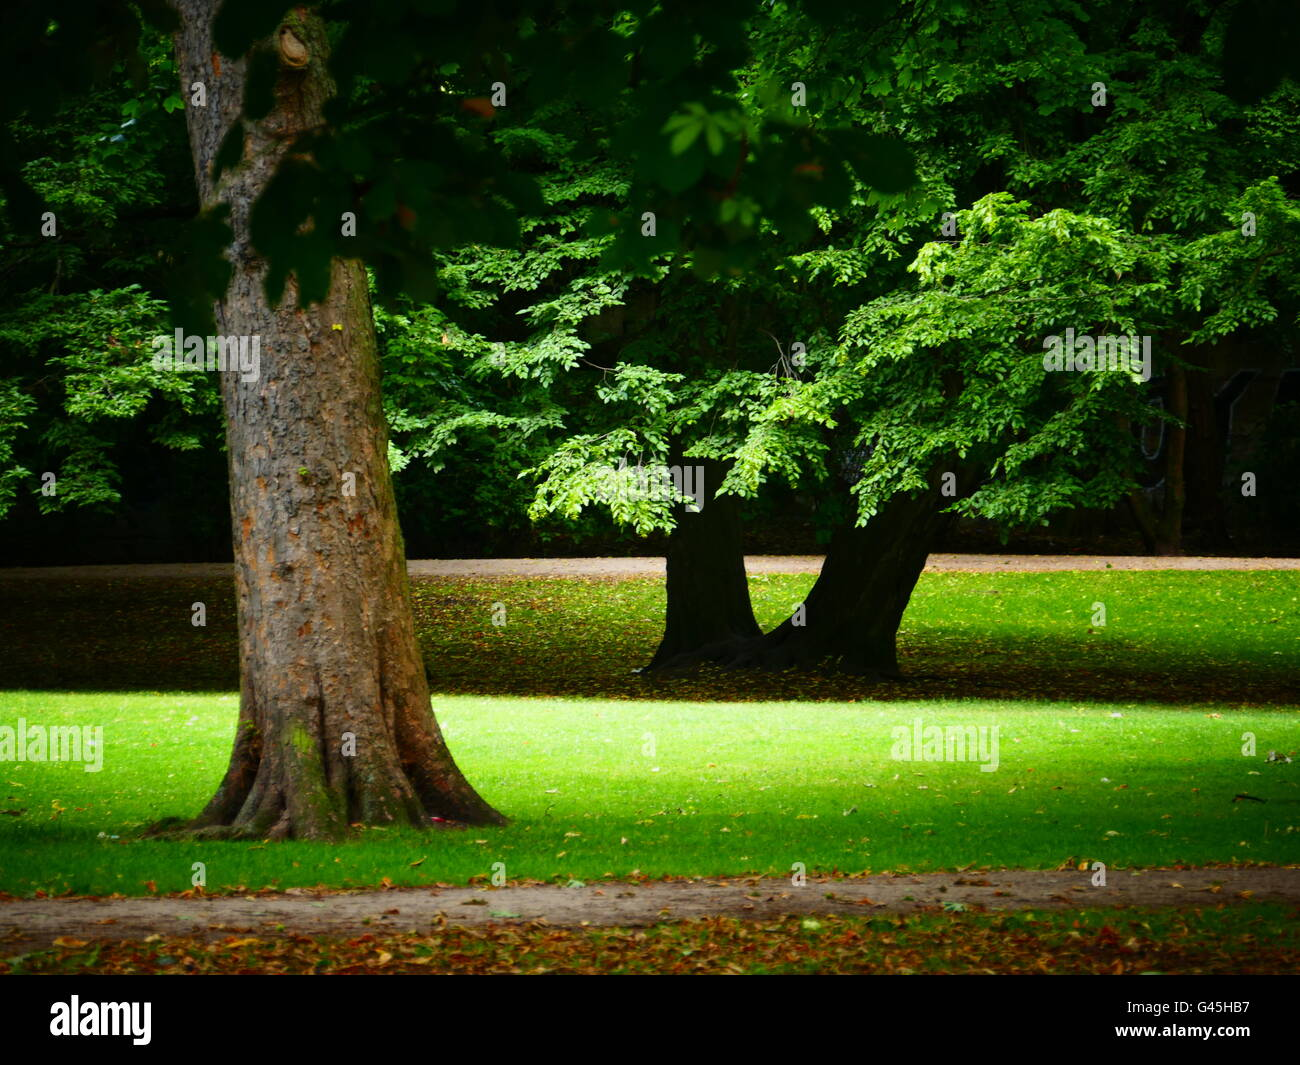 Europe Germany Cologne Koln Koeln Stadt park City Folks Park - Stock Image